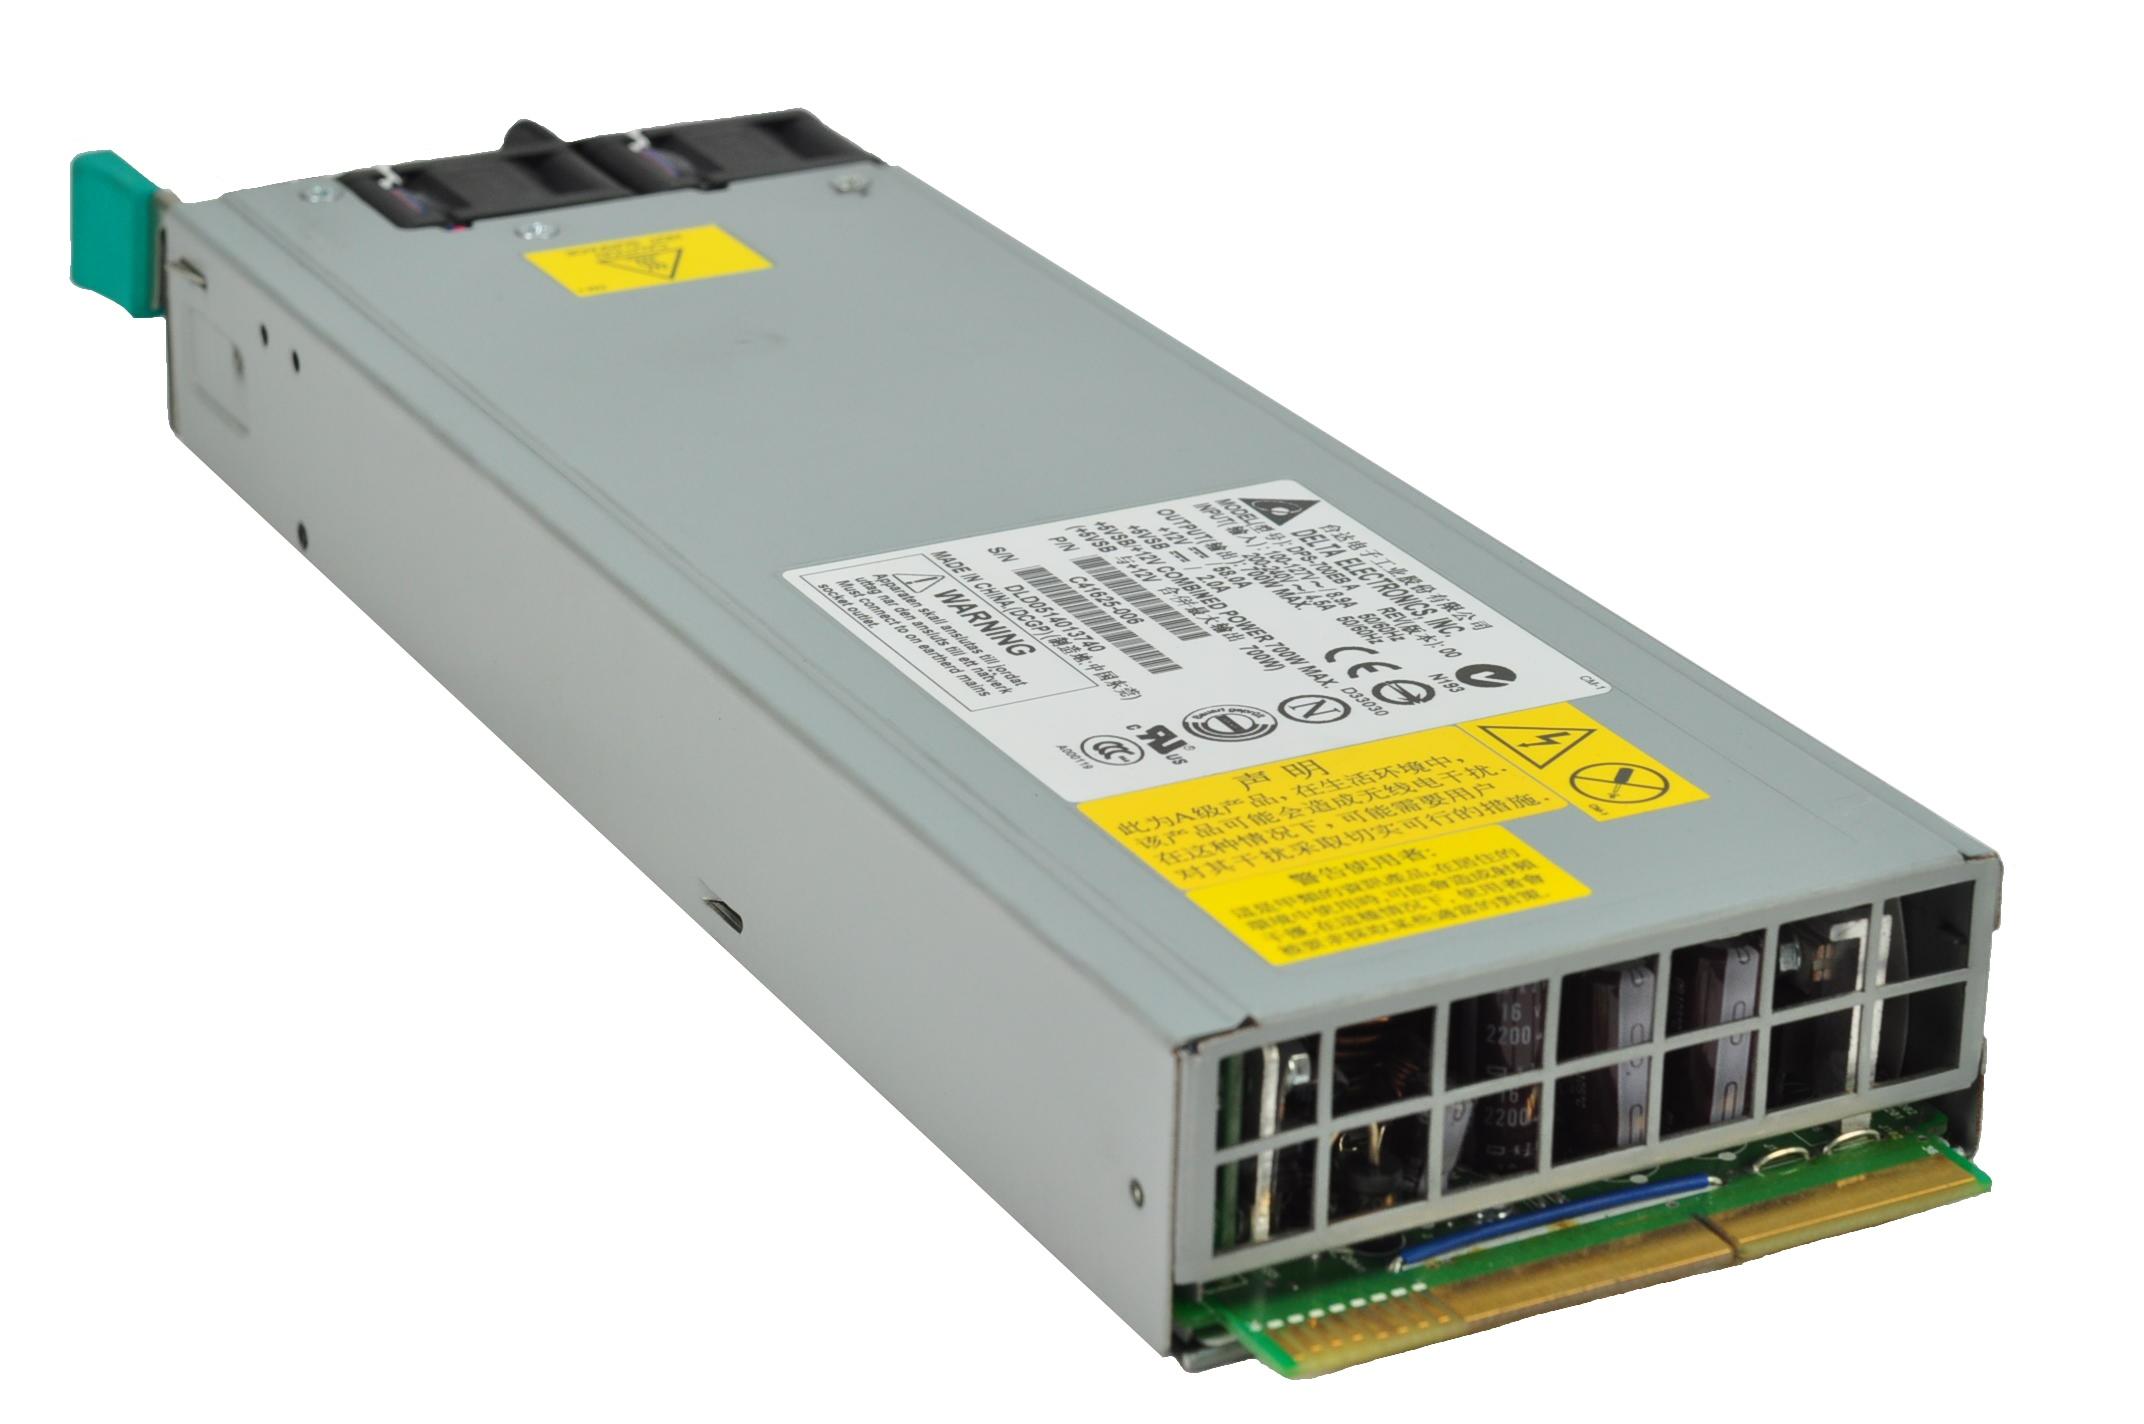 PC / Servernetzteil umbauen